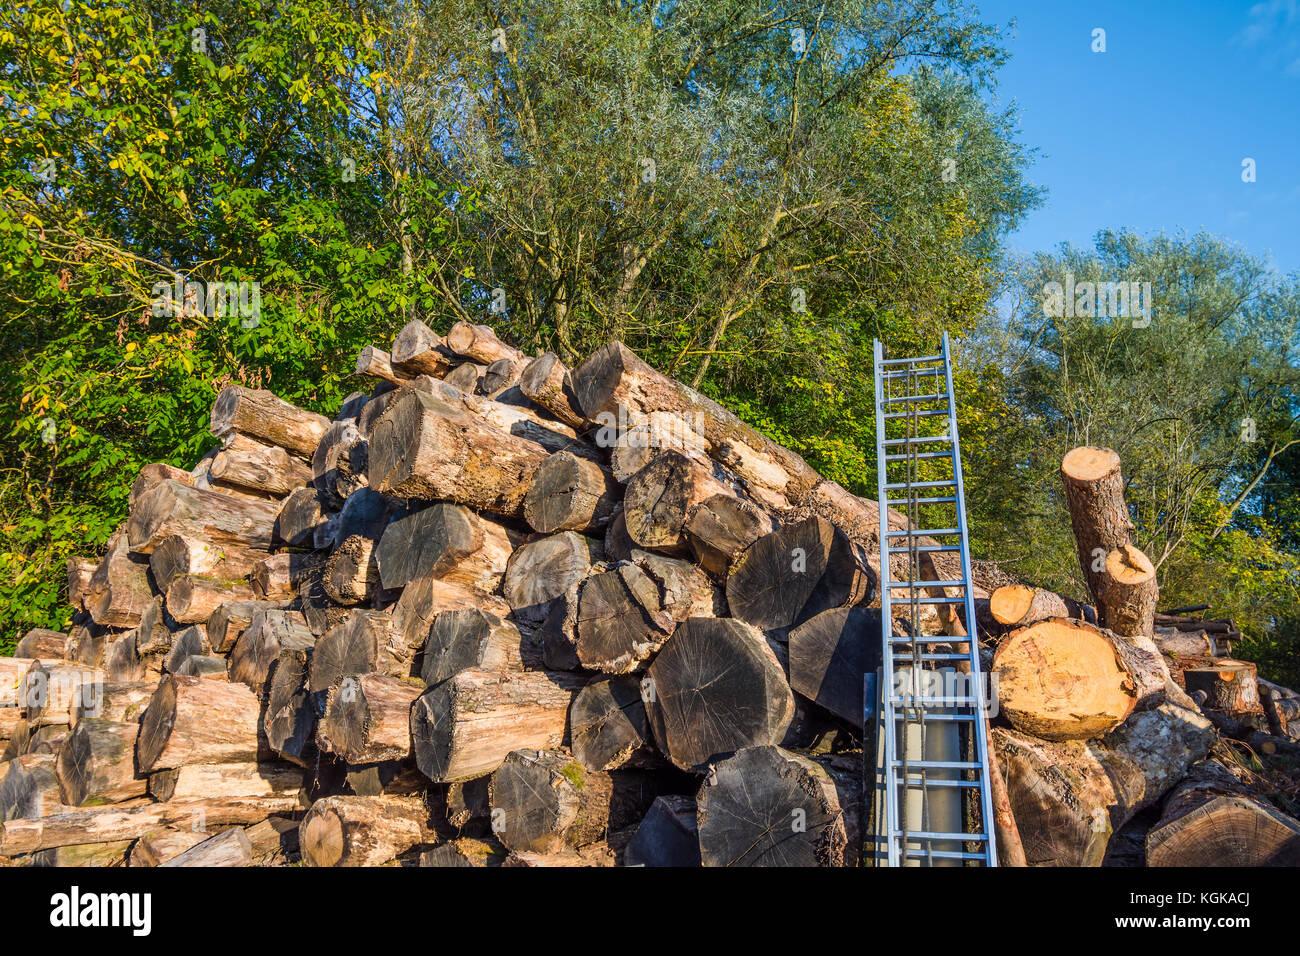 Stack of felled tree trunks - France. - Stock Image